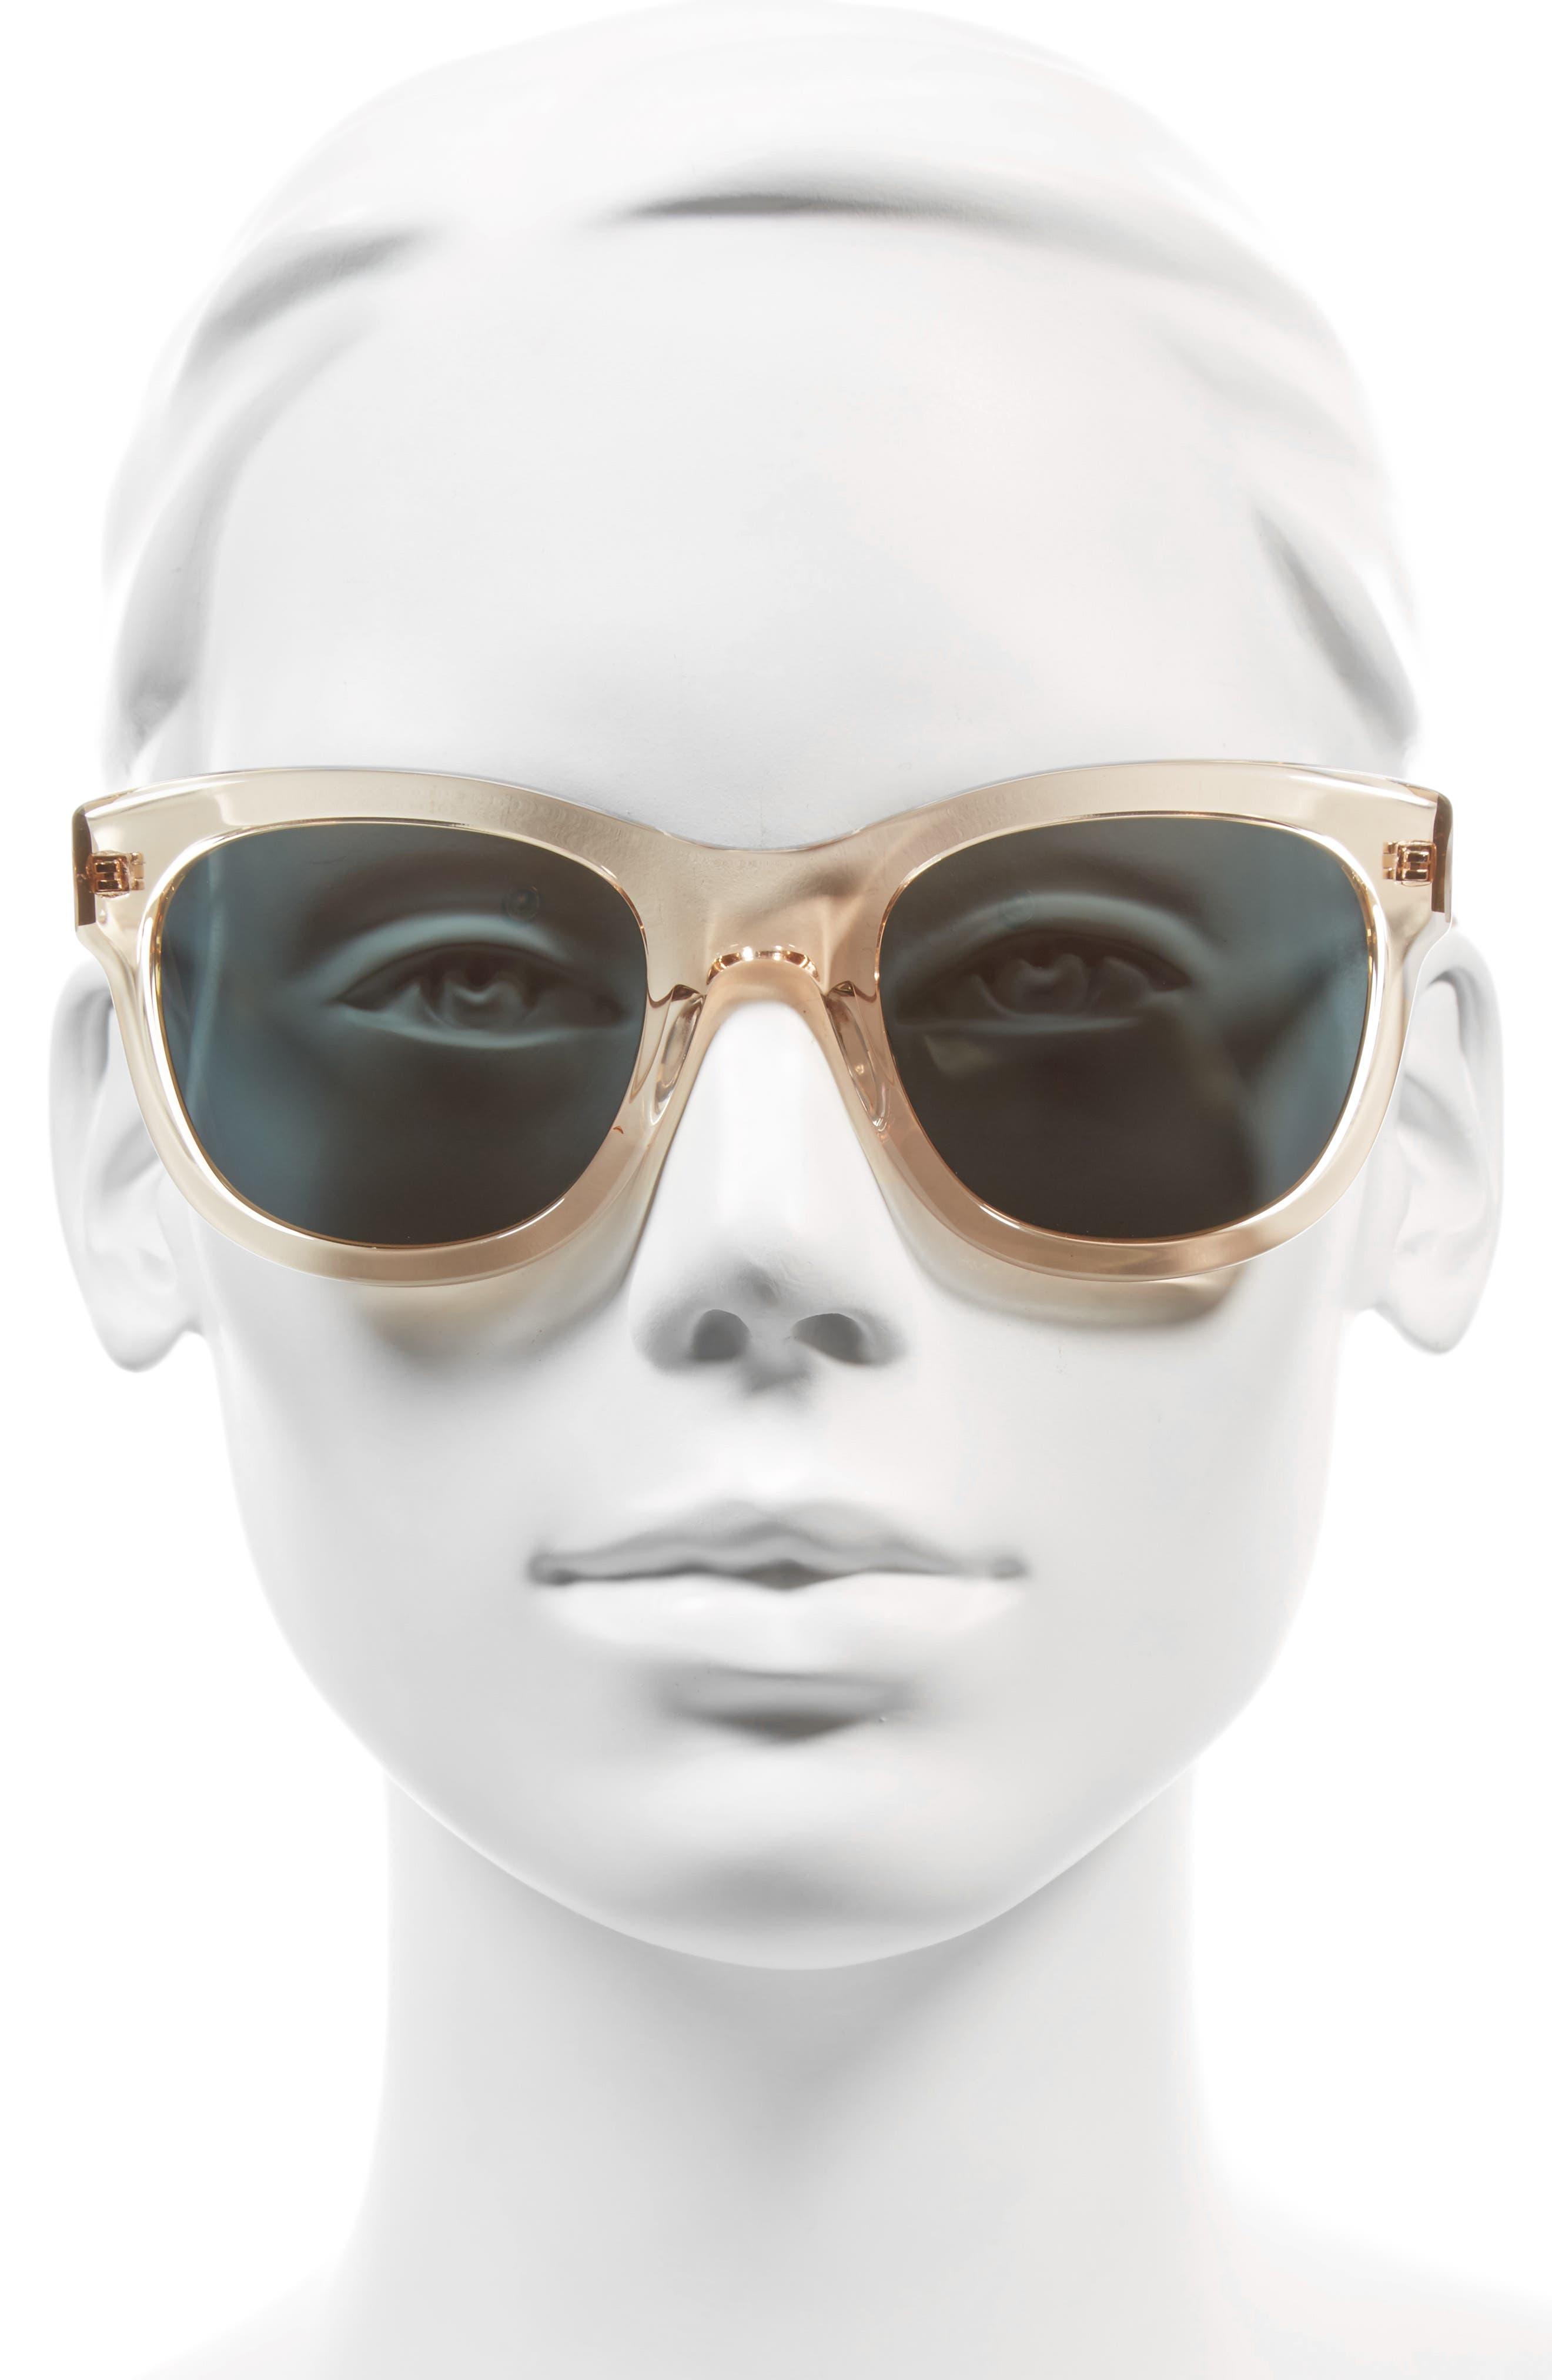 Billingsley 53mm Polarized Rectangular Sunglasses,                             Alternate thumbnail 2, color,                             300